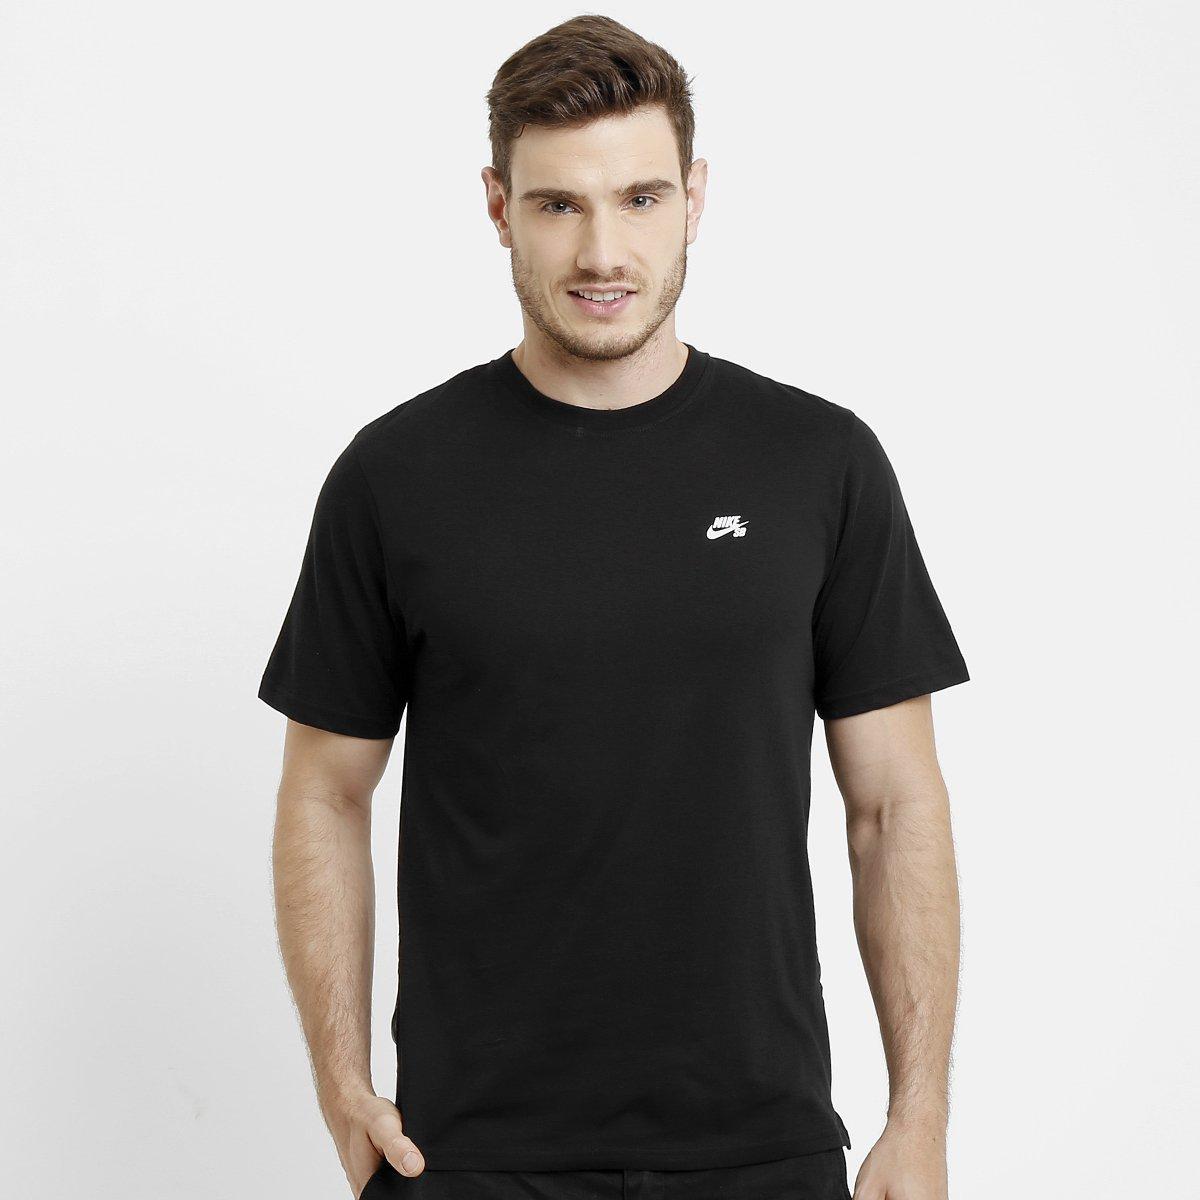 7060d18bdd5bf Camiseta Nike Sb Knit Overlay Tee - Compre Agora